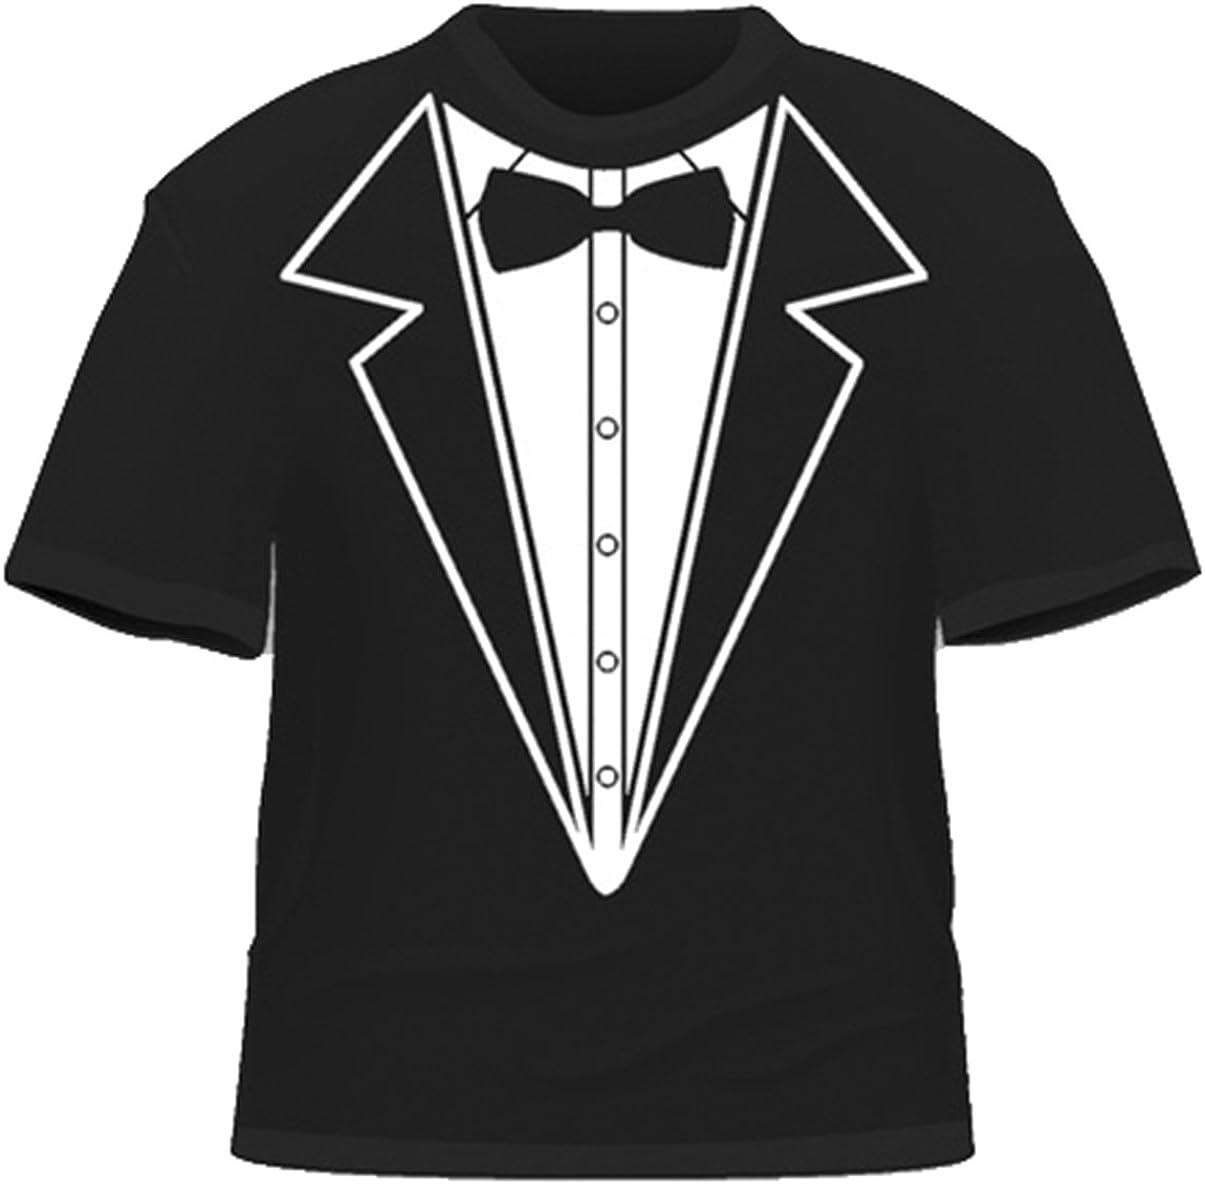 Camiseta de Smoking/Traje